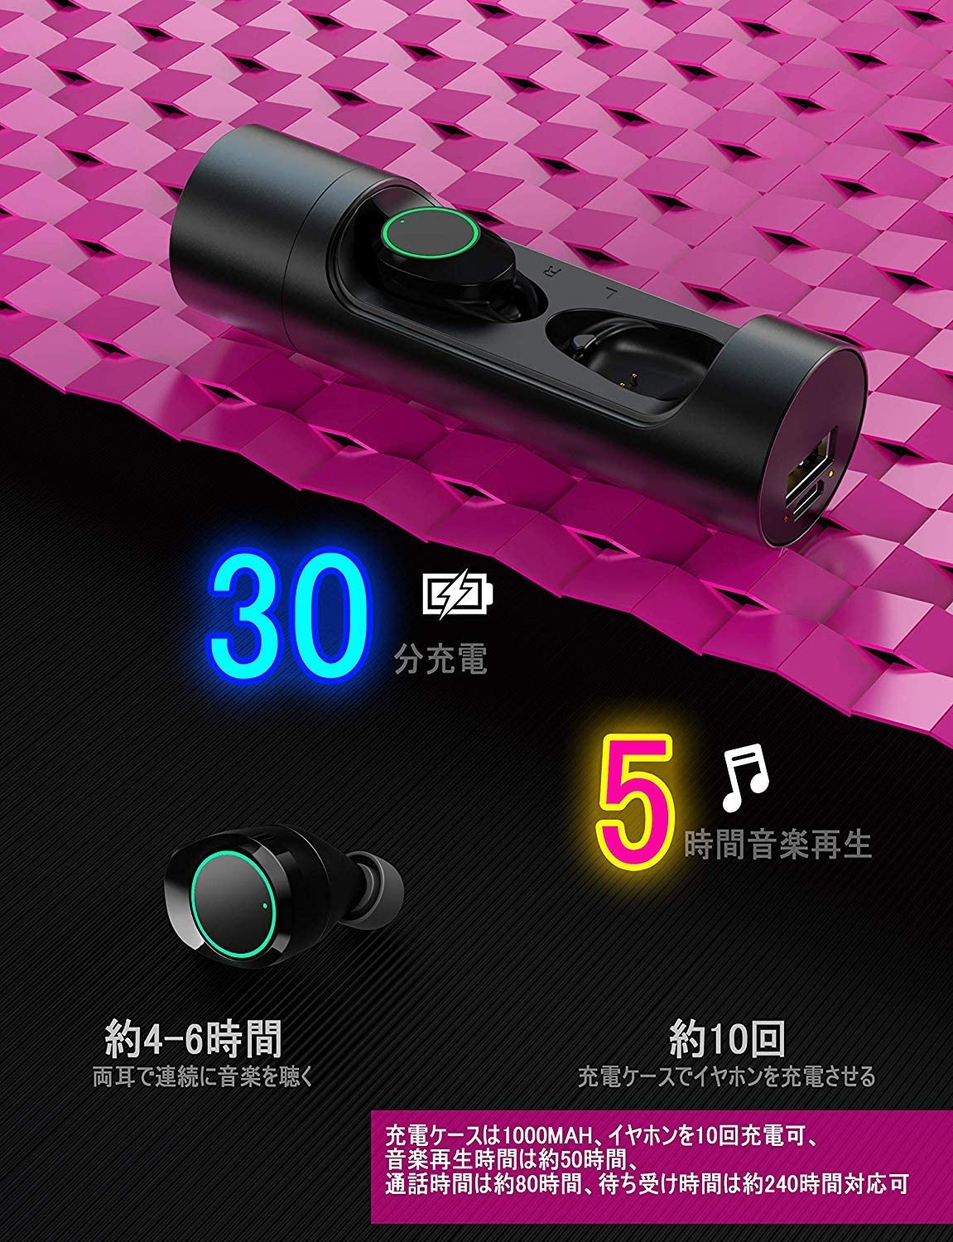 Beyeah(ベイヤー) 金属回転式充電ケース Bluetoothイヤホンの商品画像5